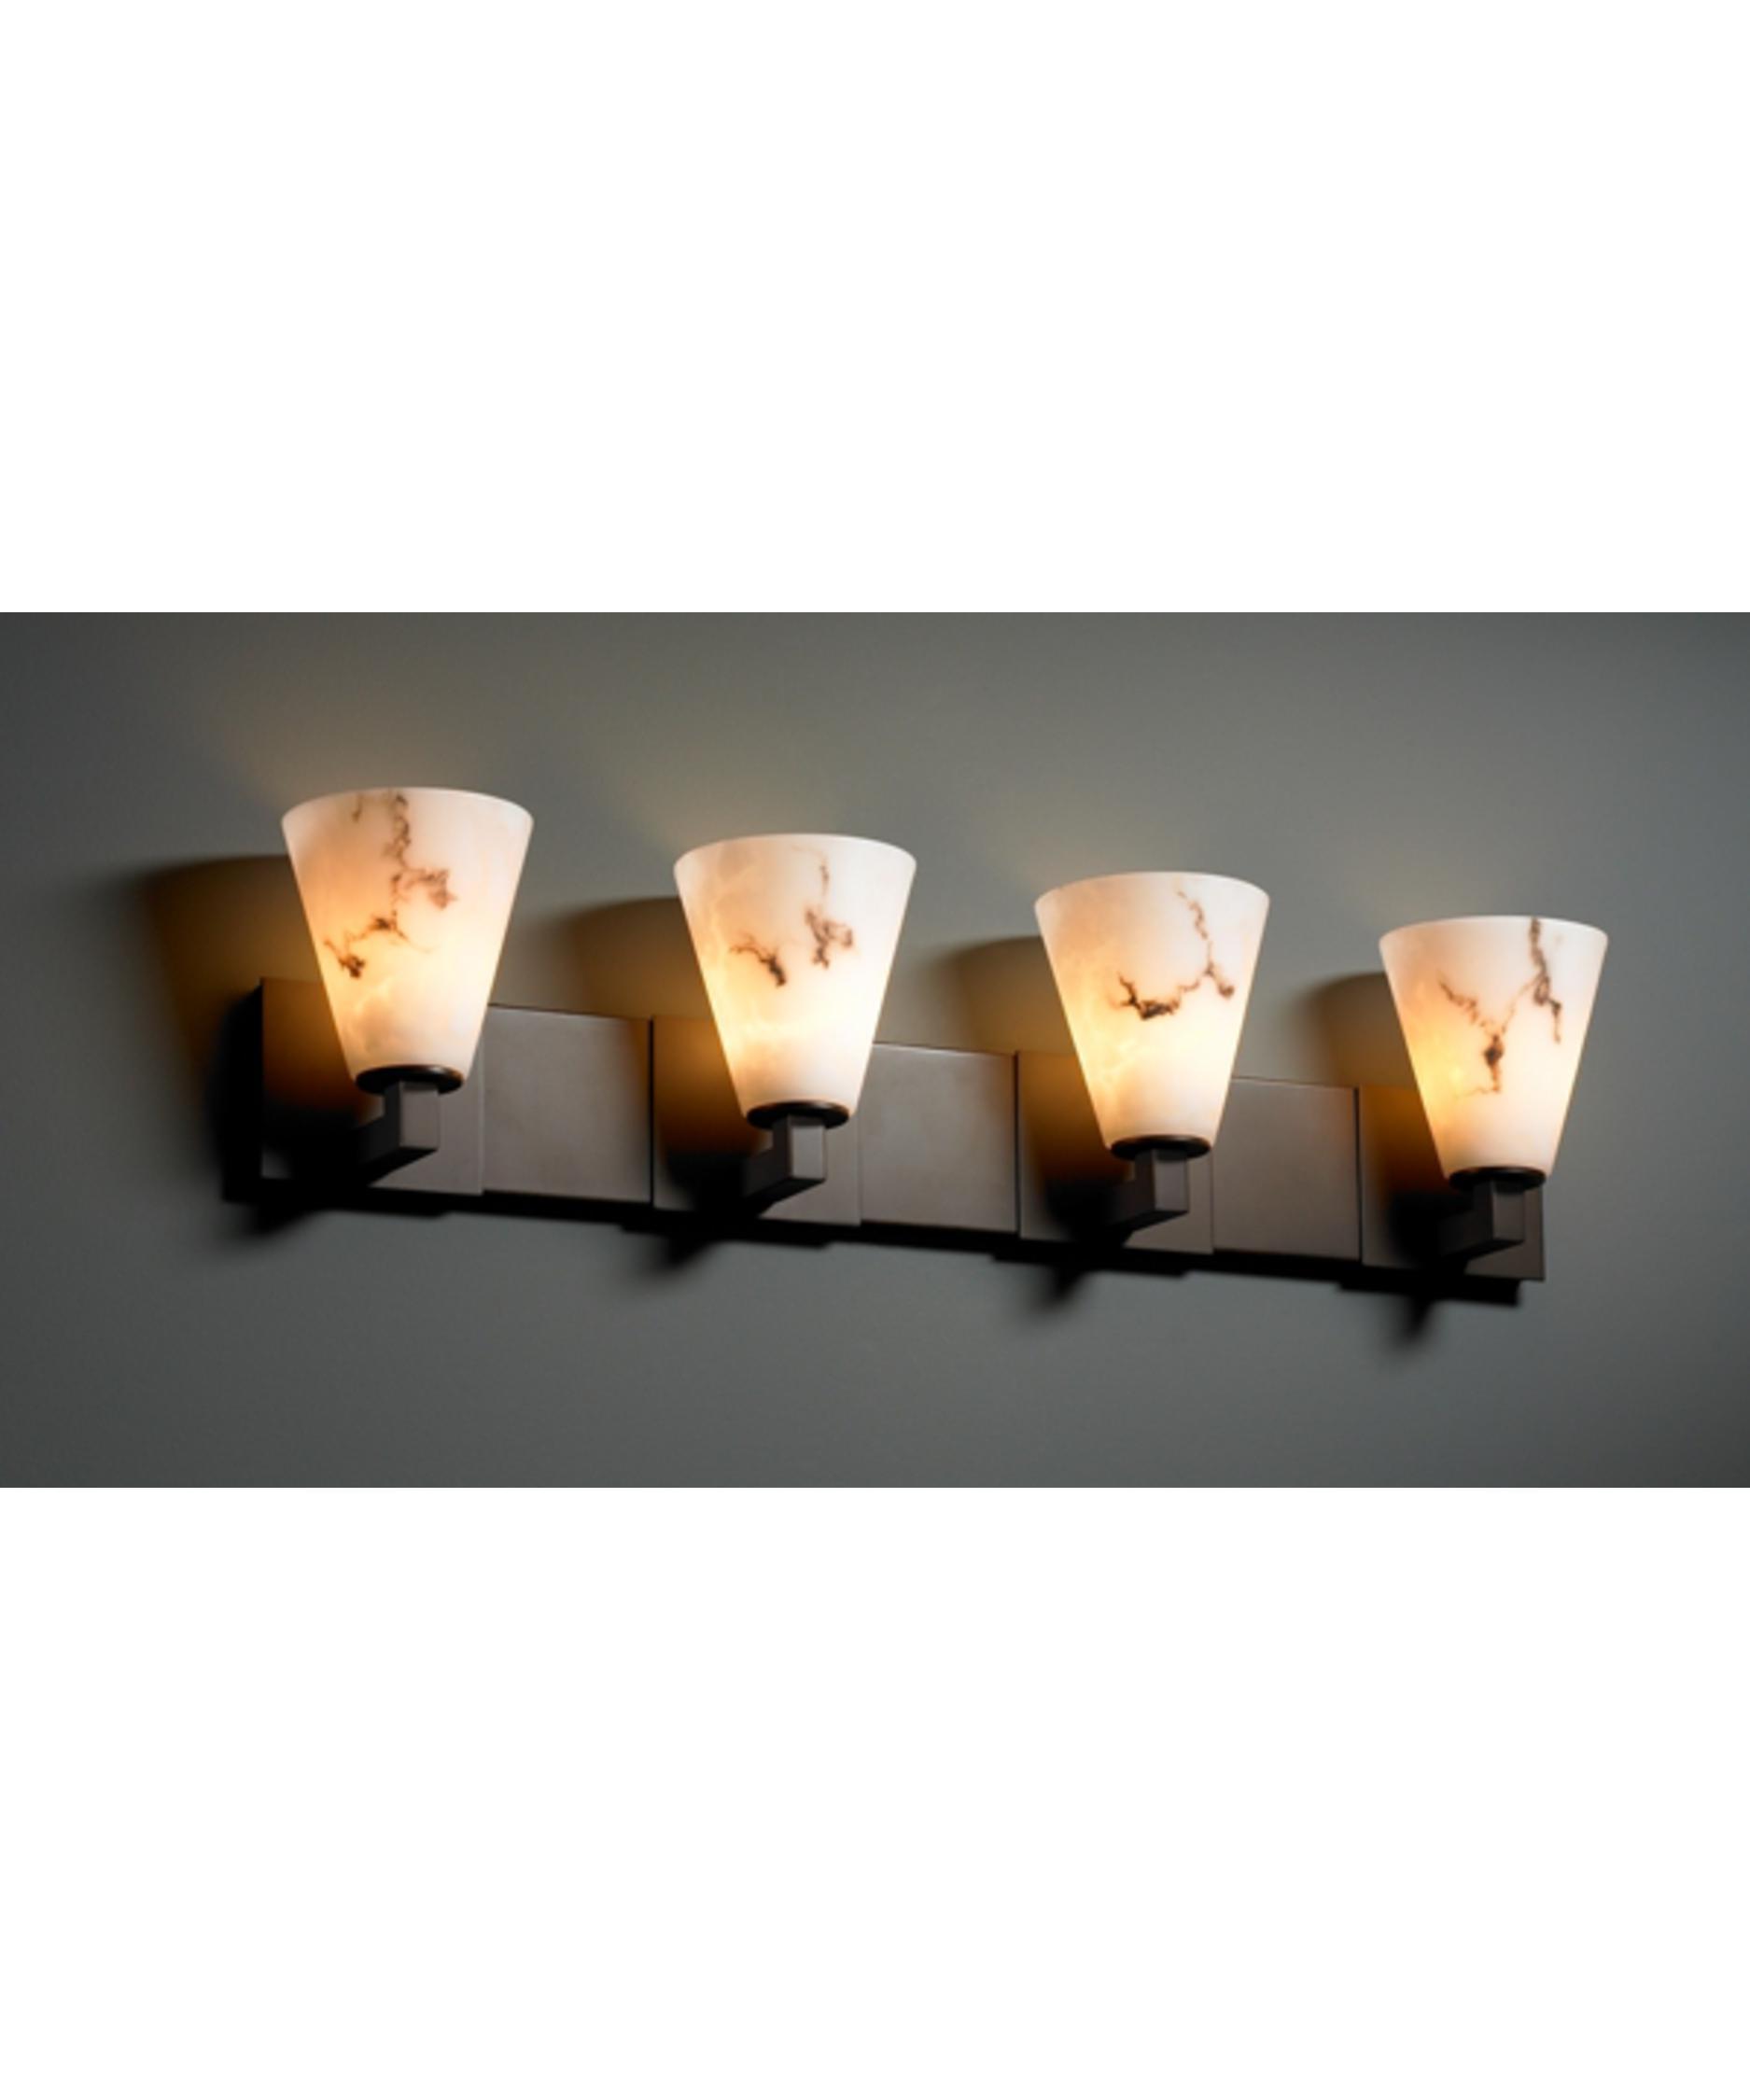 Justice design group lumenaria modular 36 inch bath vanity light capitol lighting 1 - Justice design group bathroom lighting ...